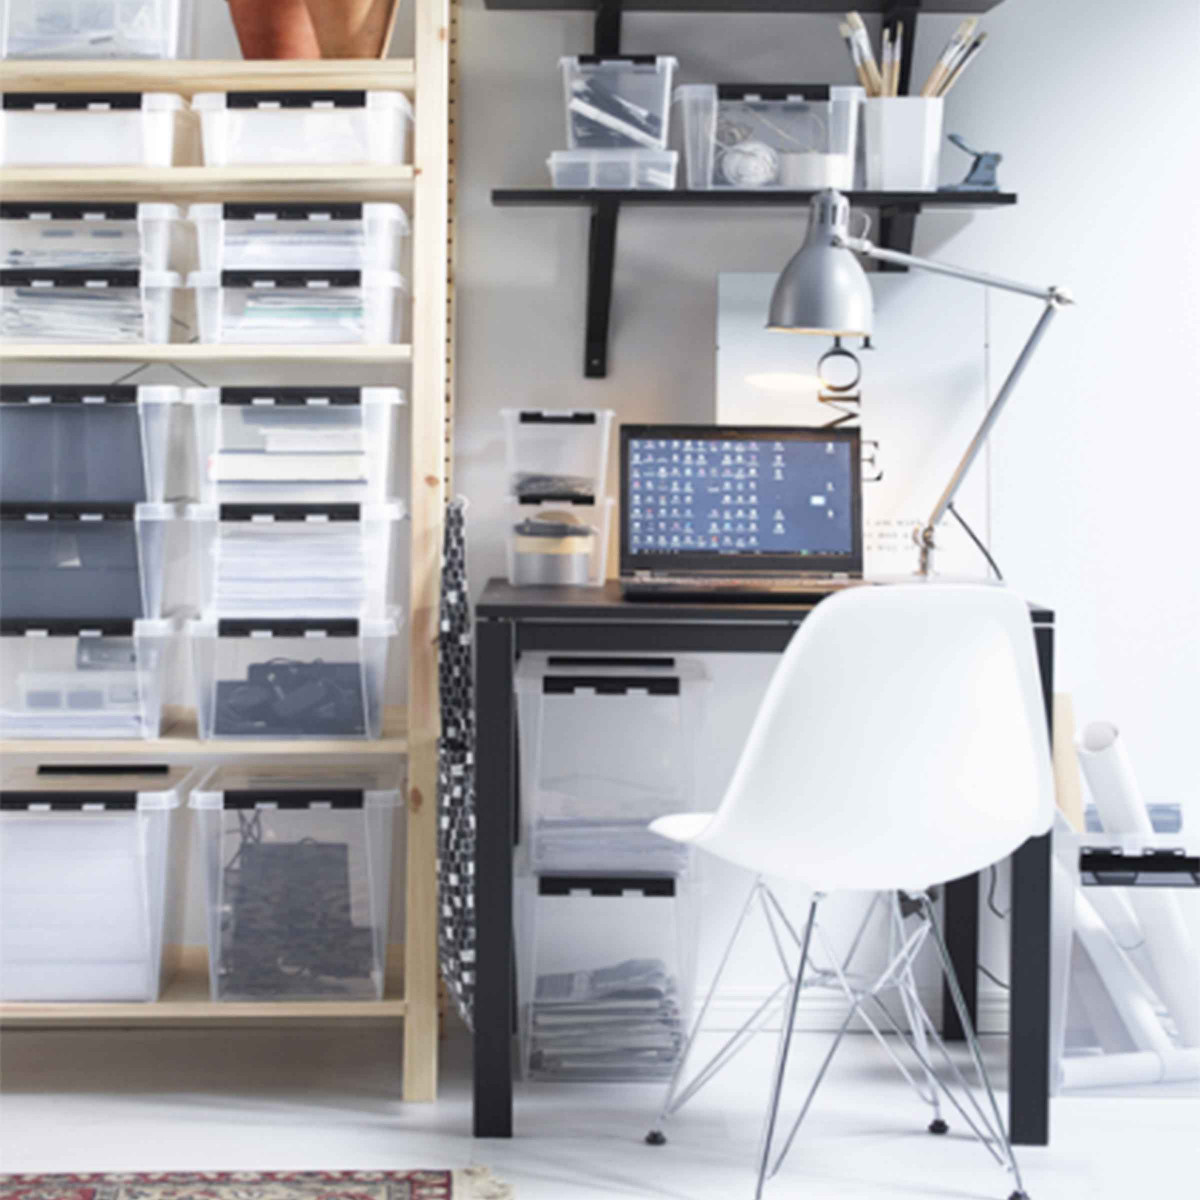 bo te de rangement 2 compartiments 14 litres. Black Bedroom Furniture Sets. Home Design Ideas